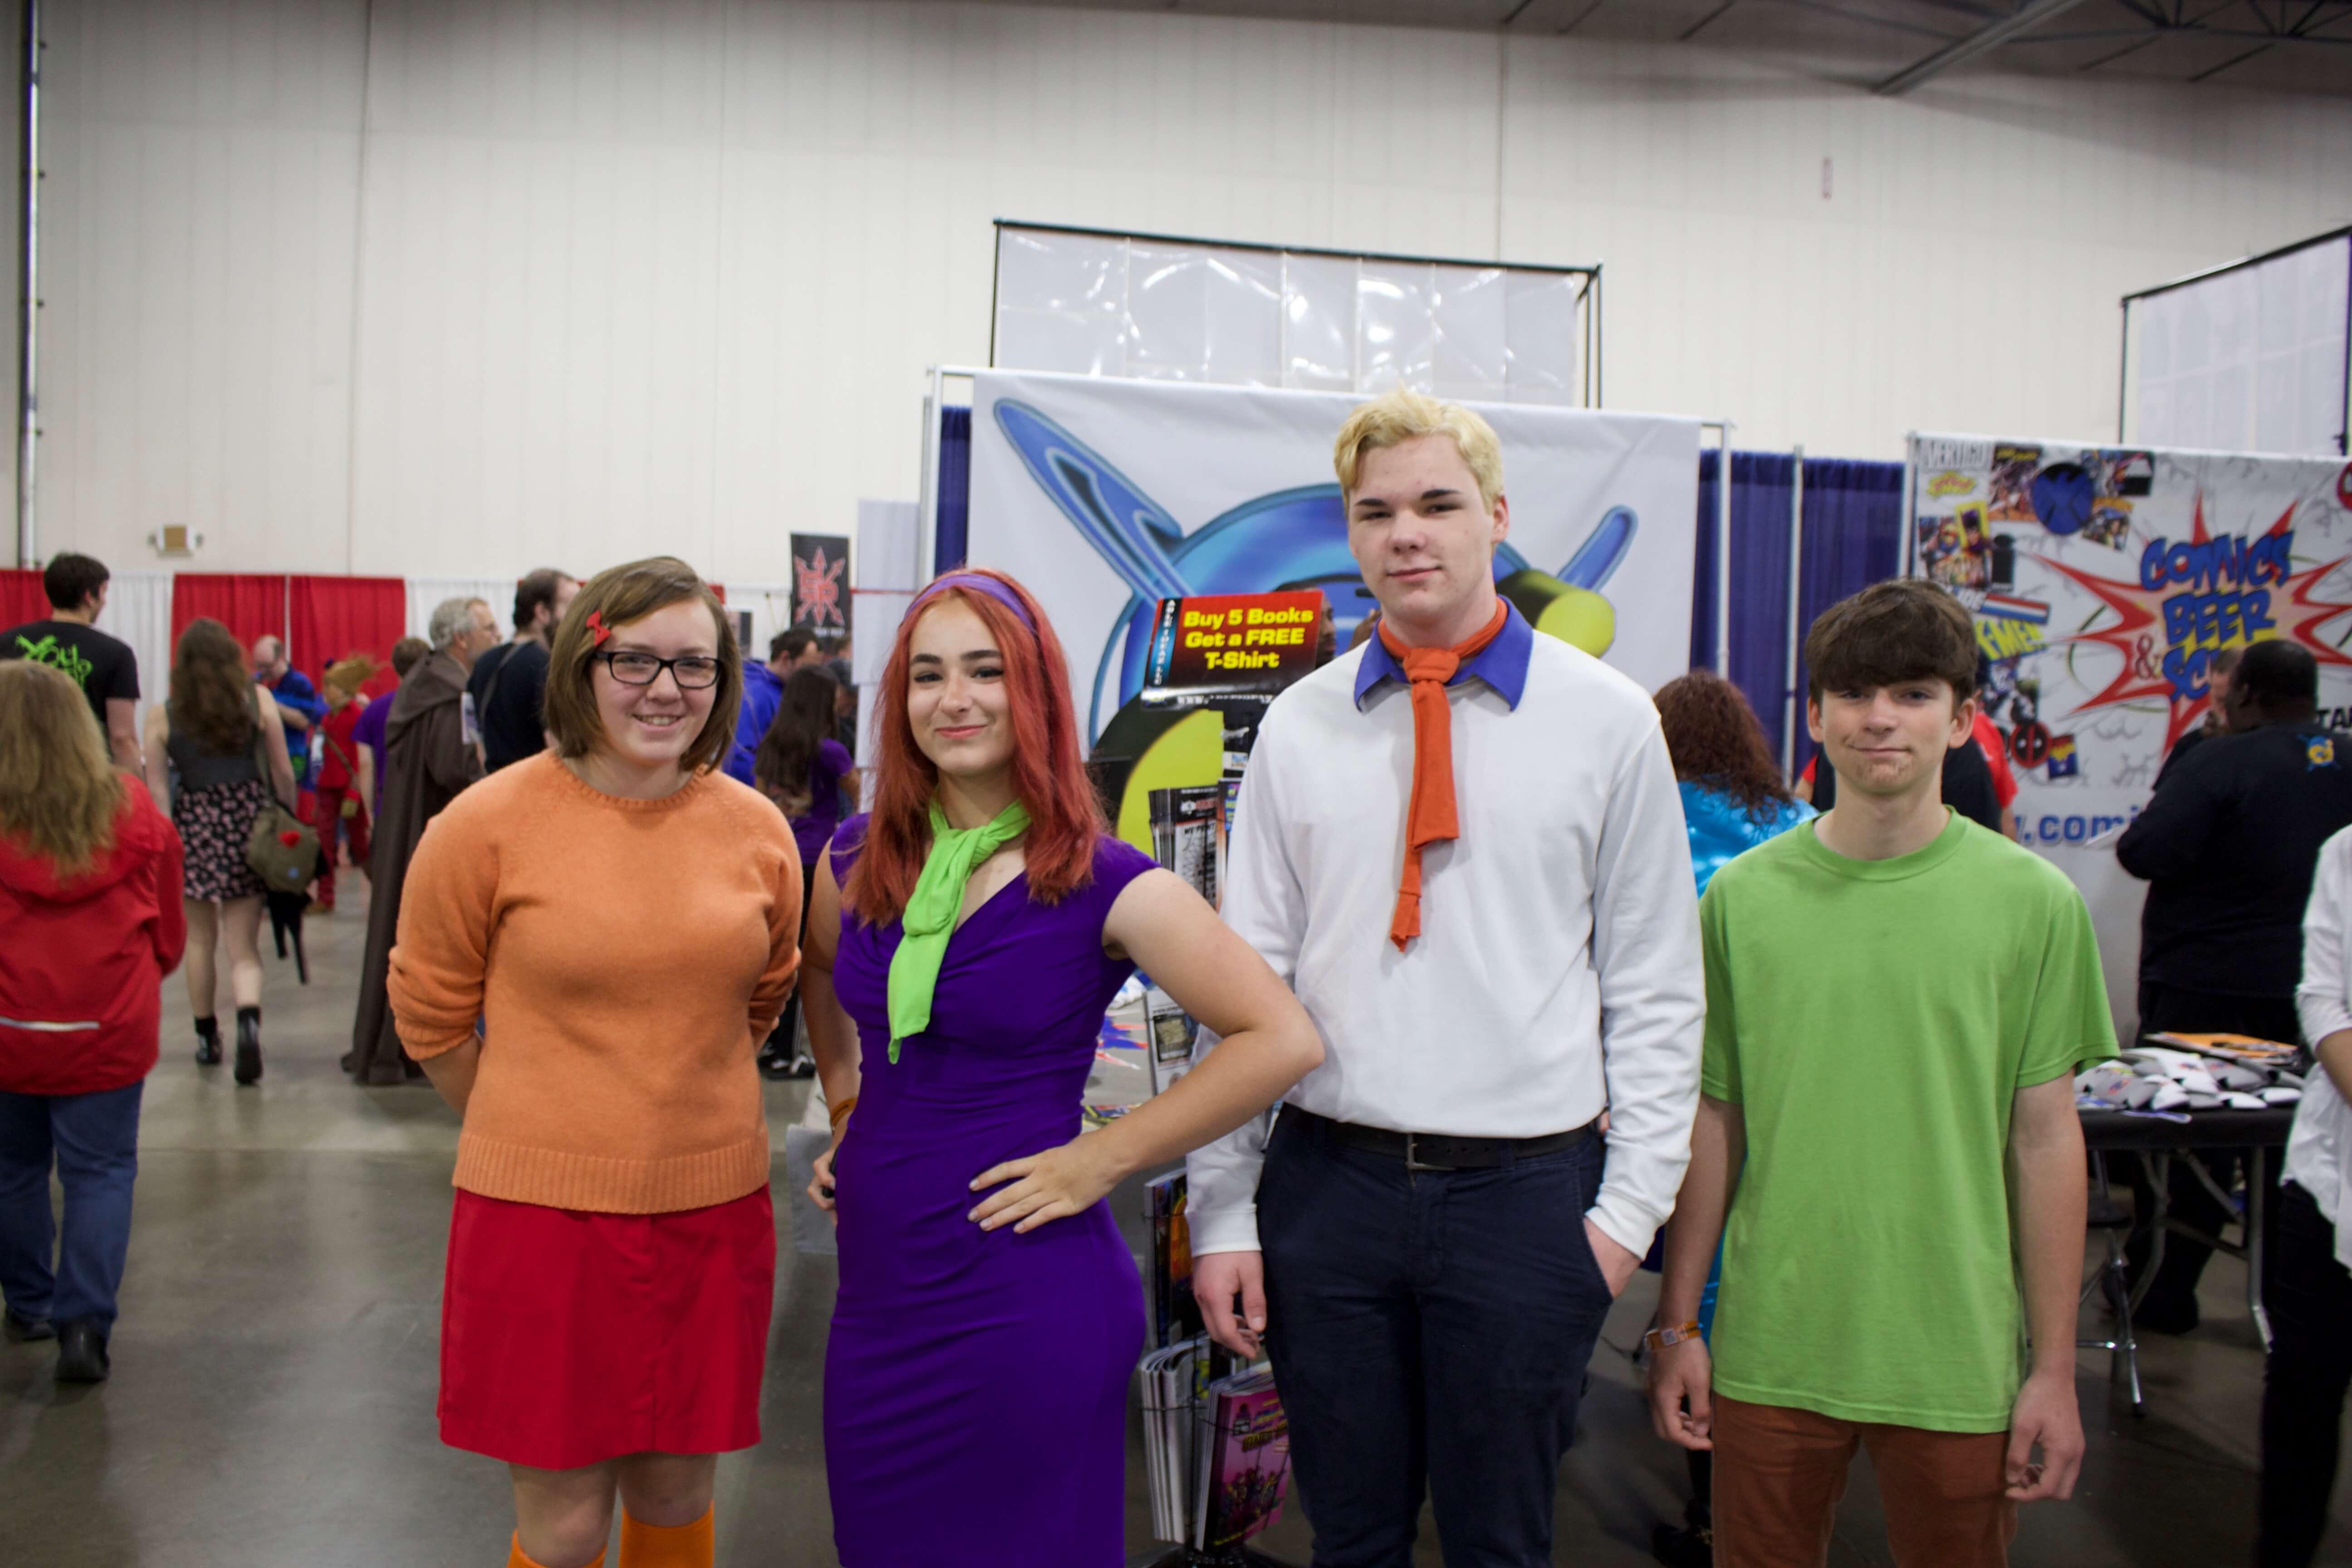 Velma, Daphne, Fred, Shaggy